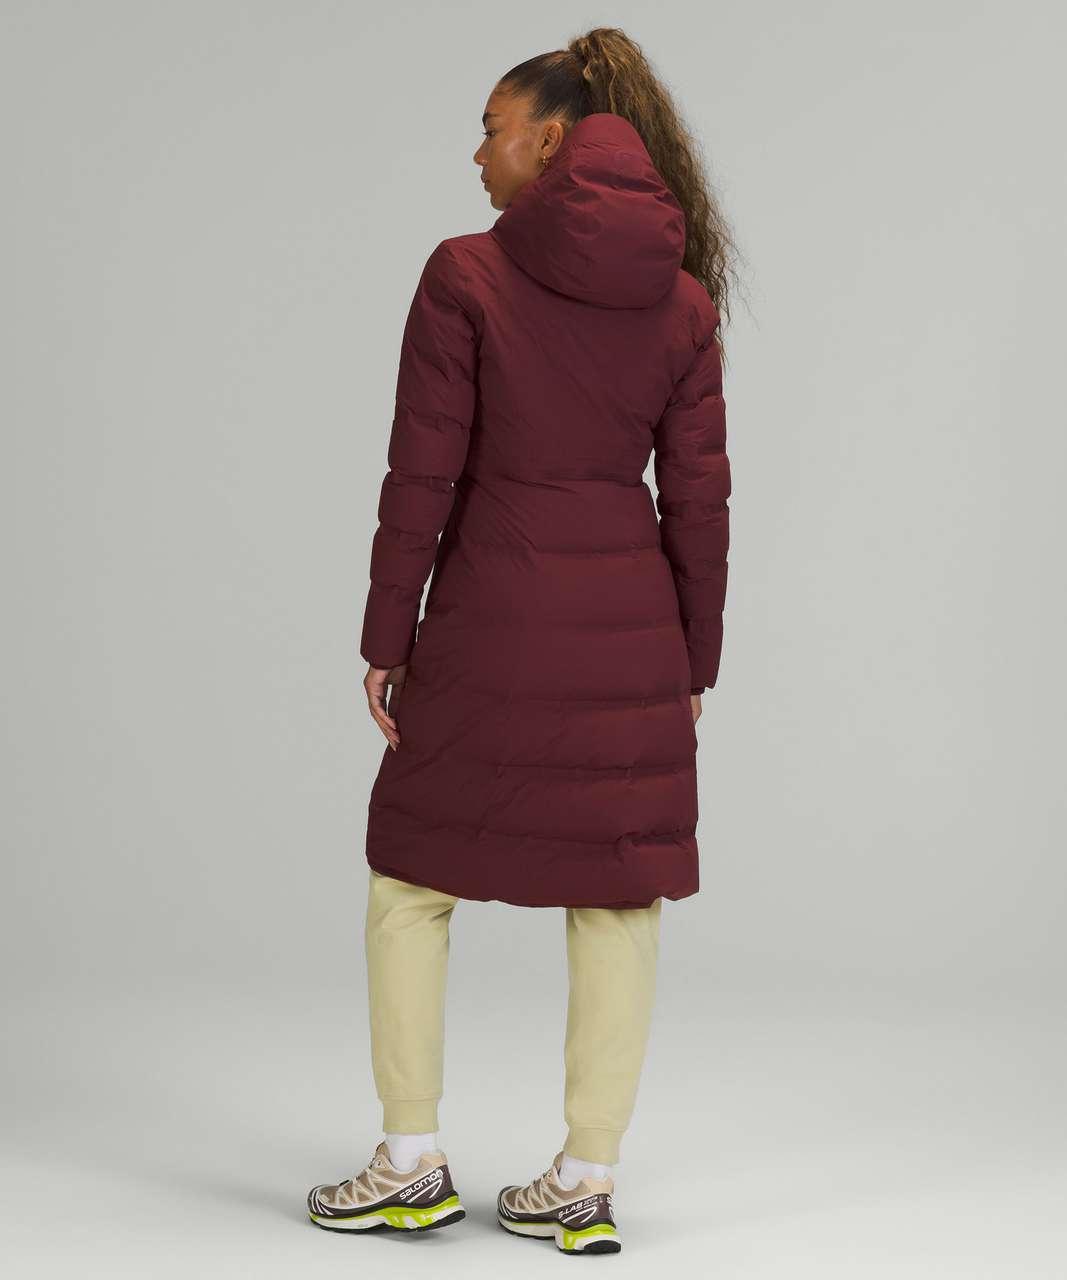 Lululemon Sleet Street Long Jacket - Red Merlot